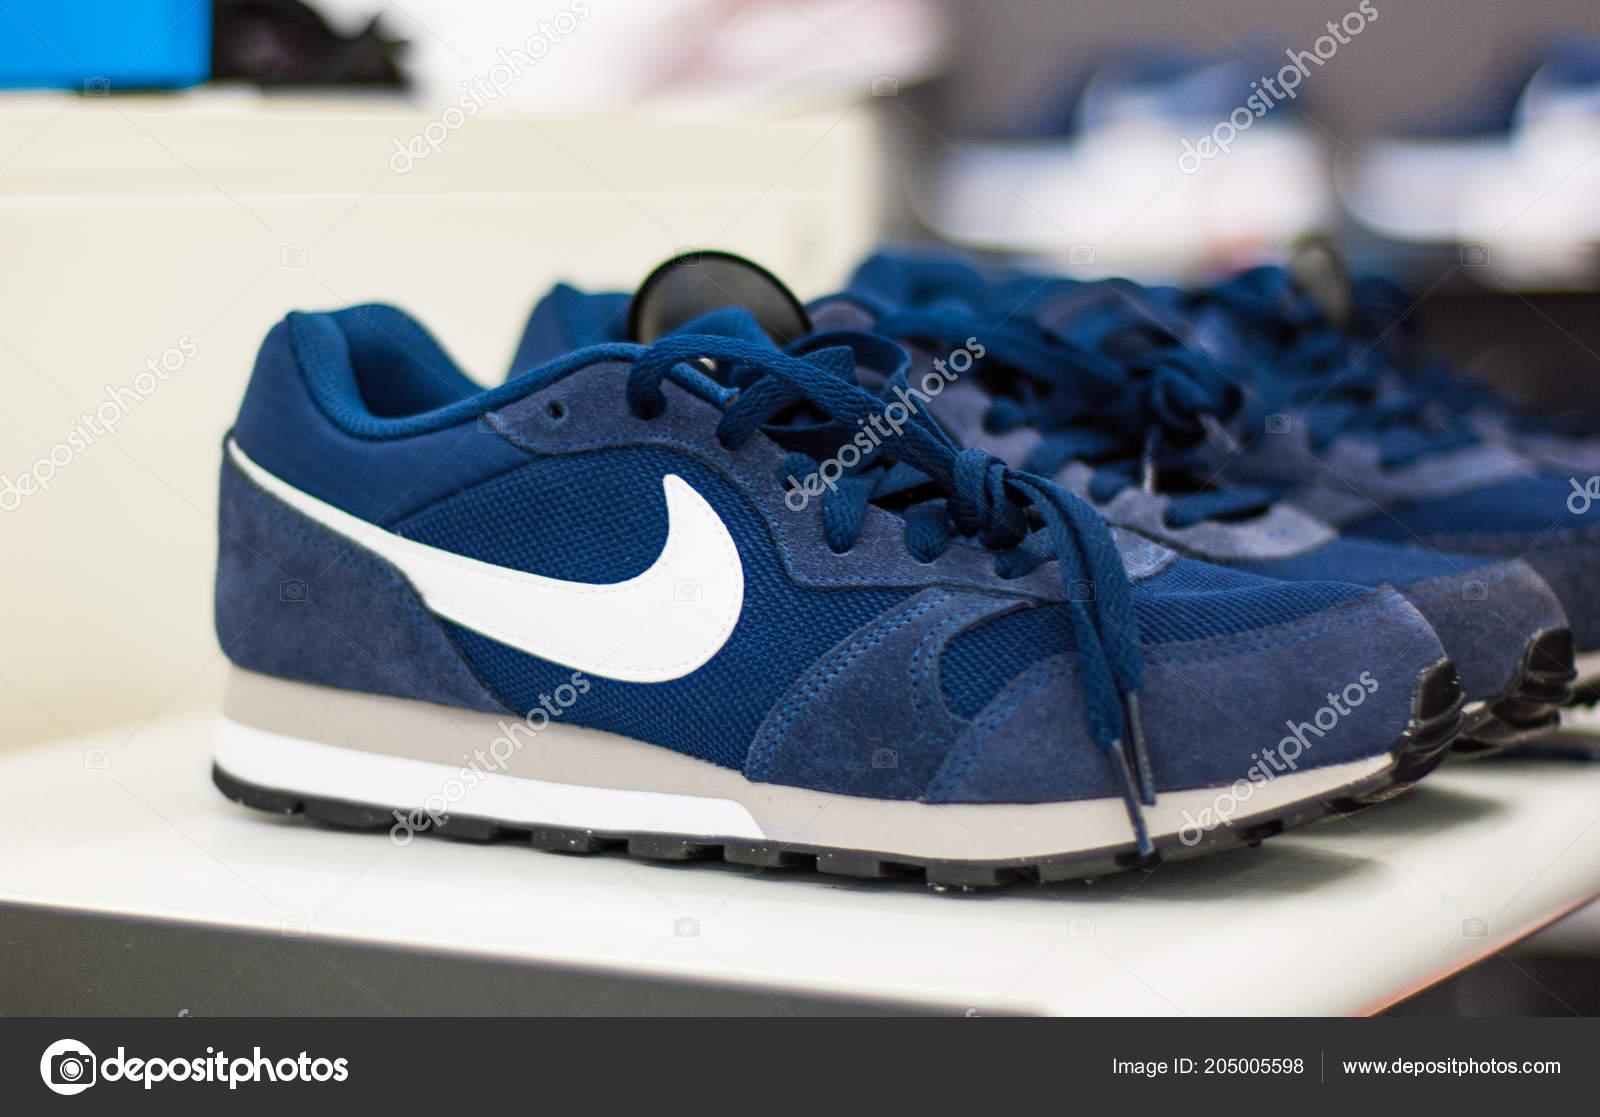 Minsk Exposition Chaussures Biélorussie Dans Sport 2018 Nike Juillet j5R3LA4